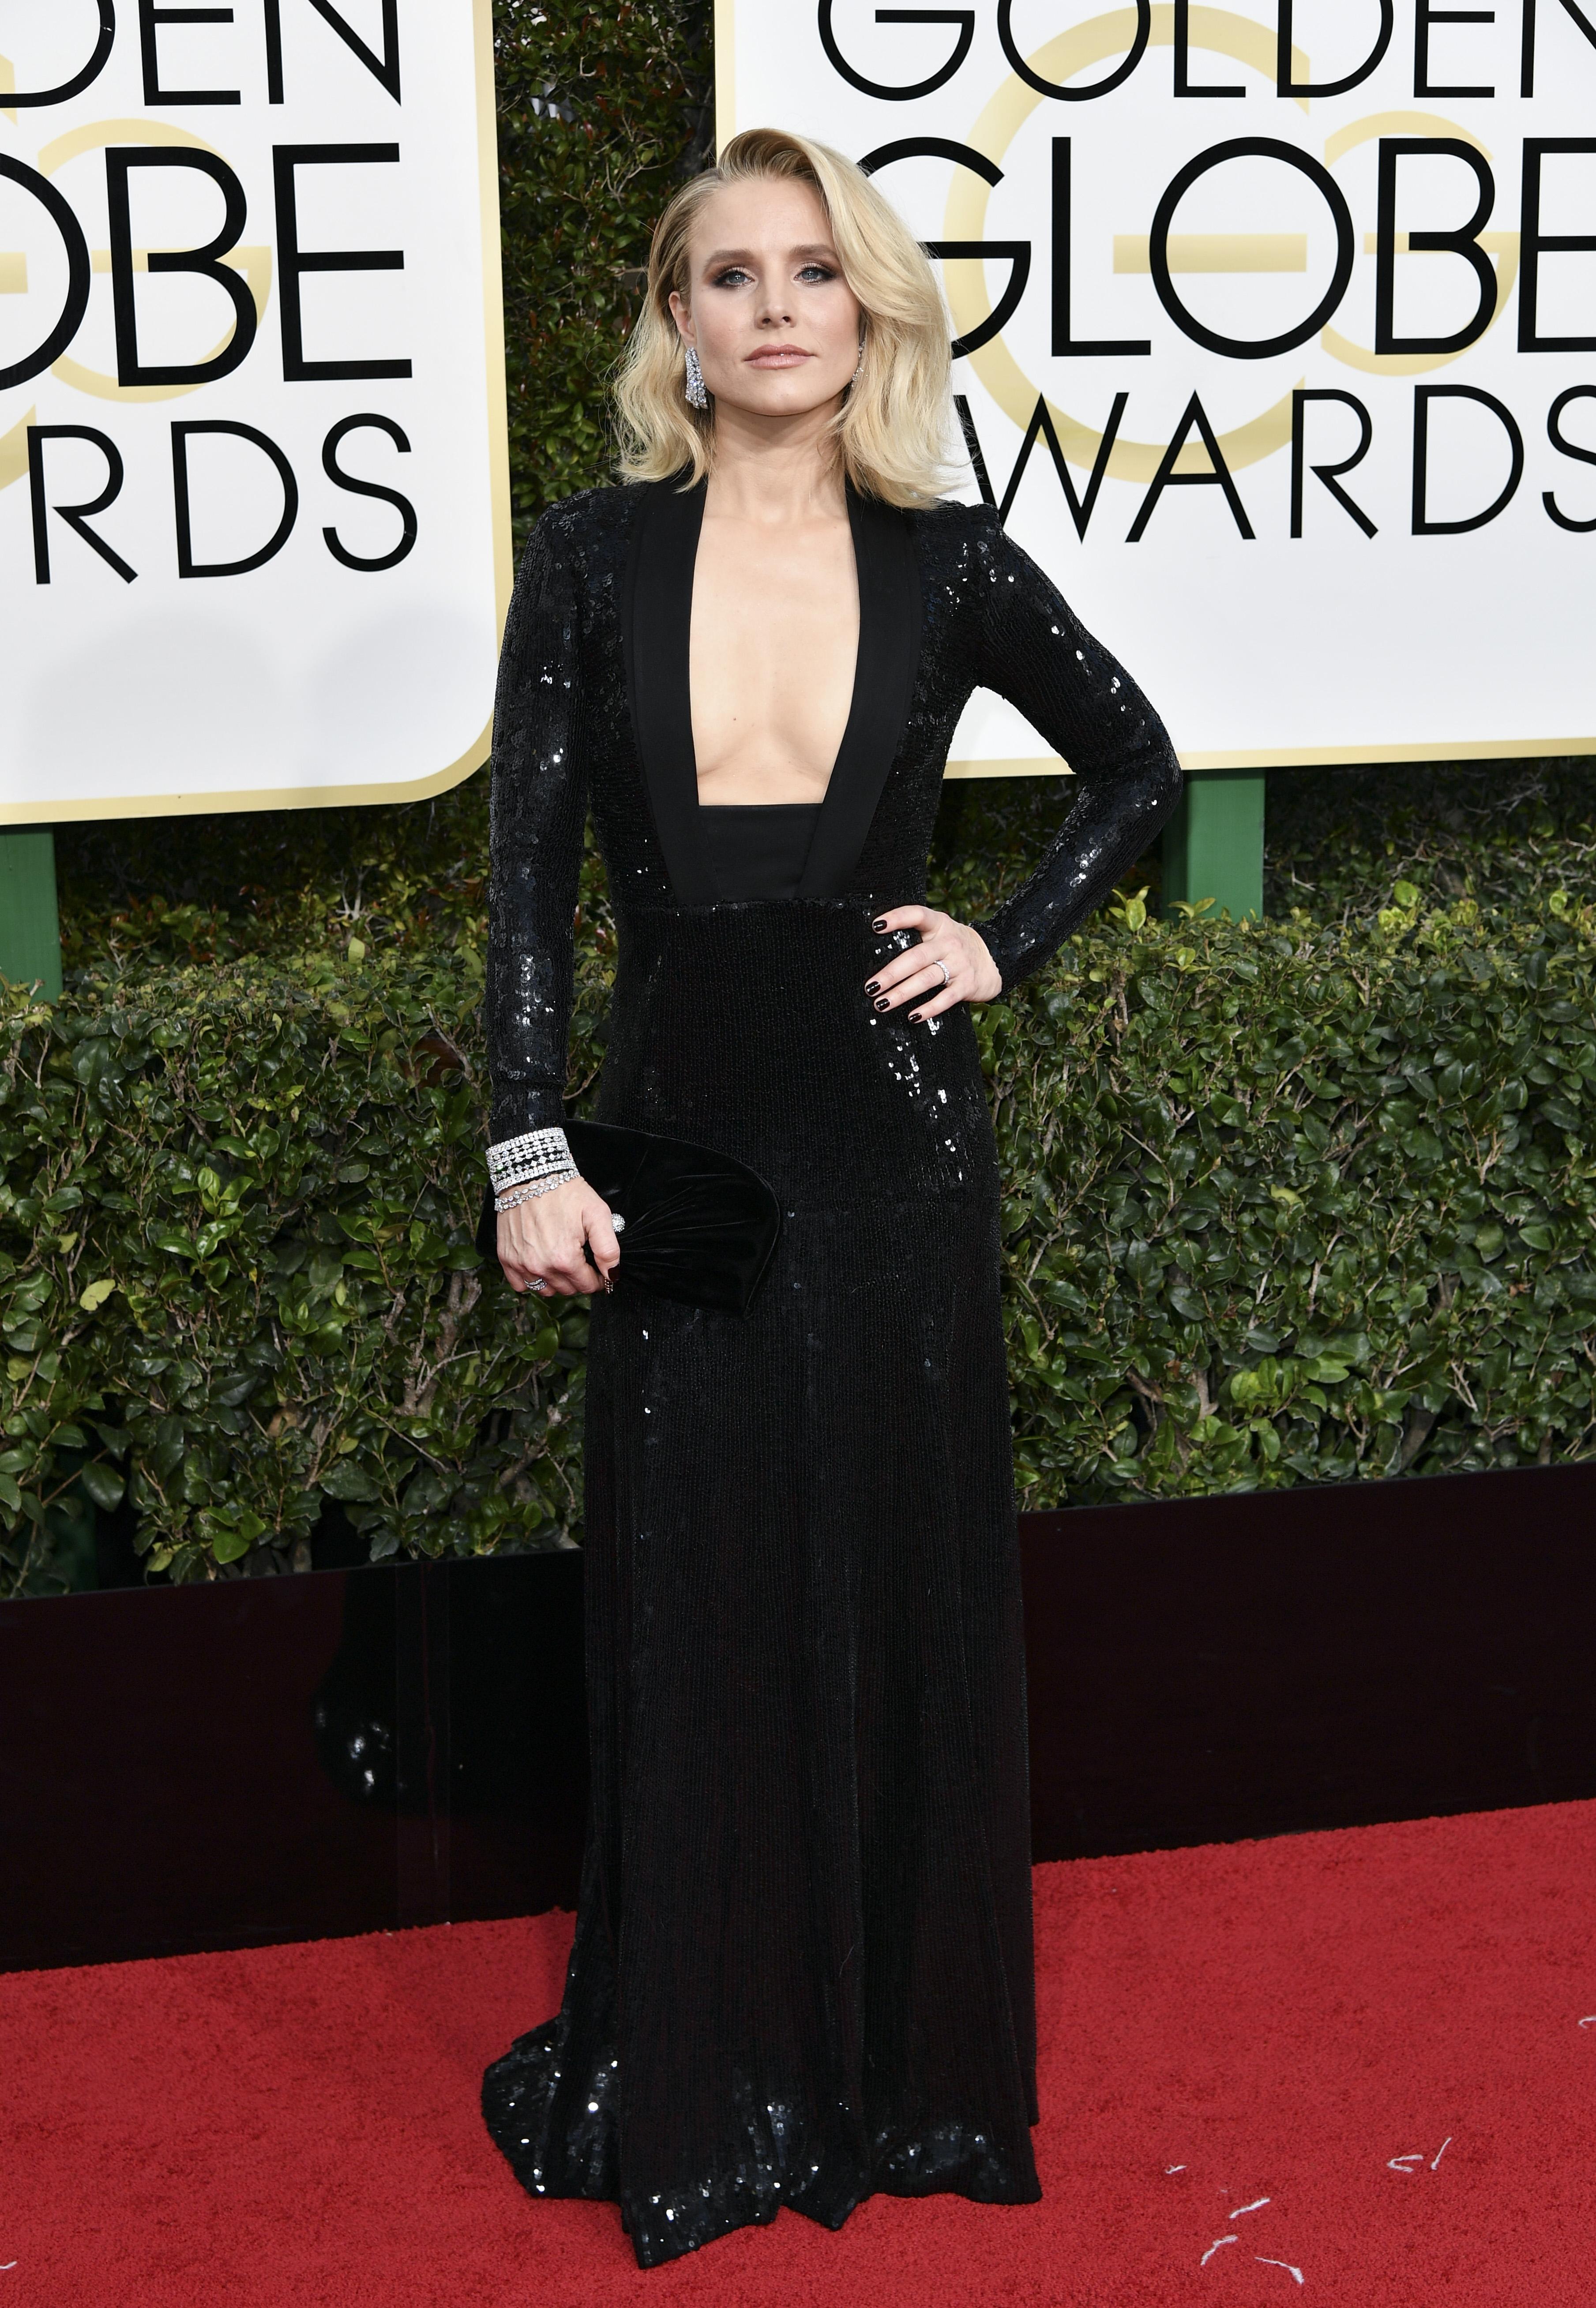 Kristen Bell, Golden Globes. Mandatory Credit: Photo by Rob Latour/REX/Shutterstock